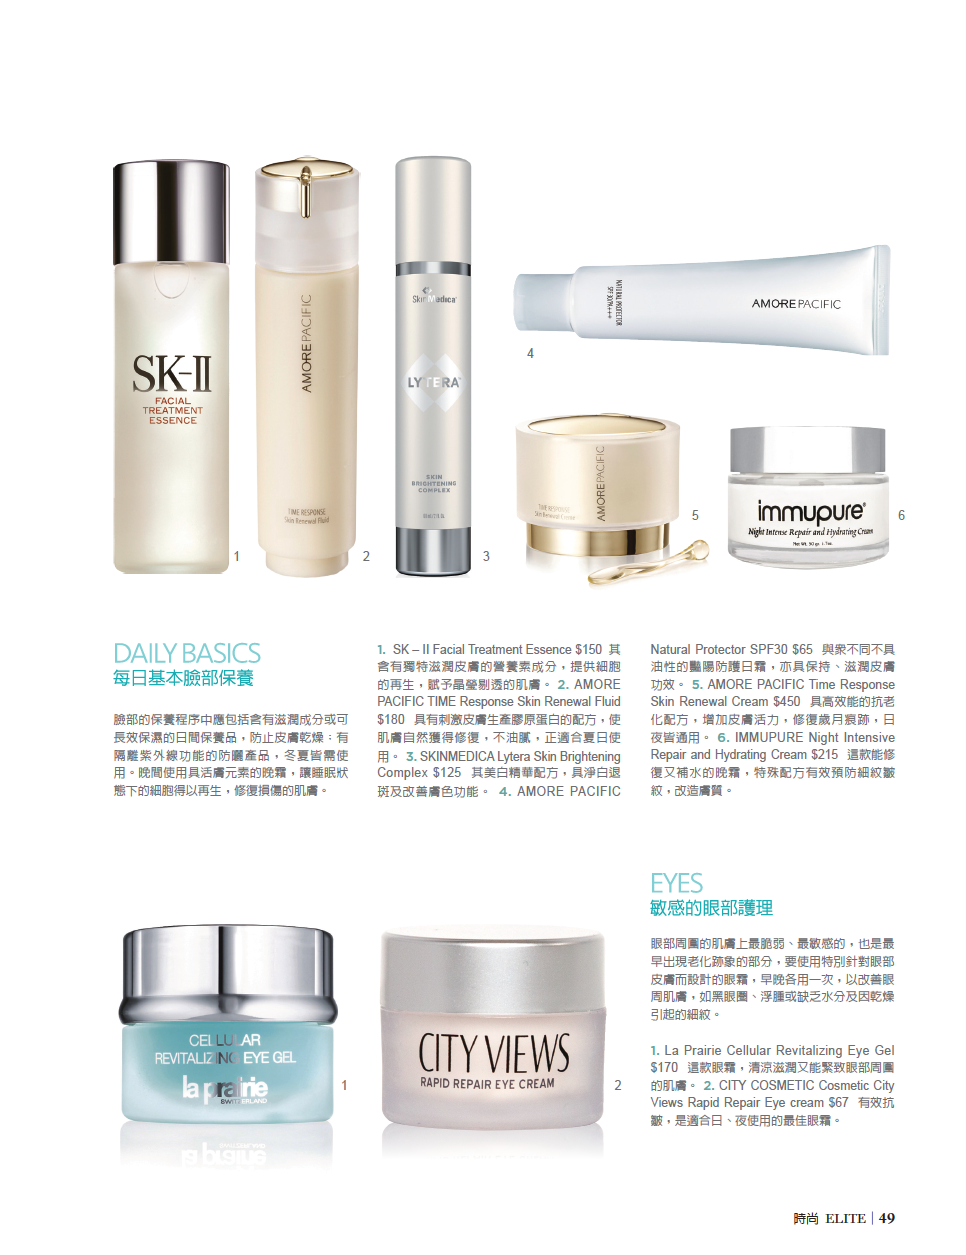 ELITE_049_Summer 2014_Daily Skincare Routine.jpg